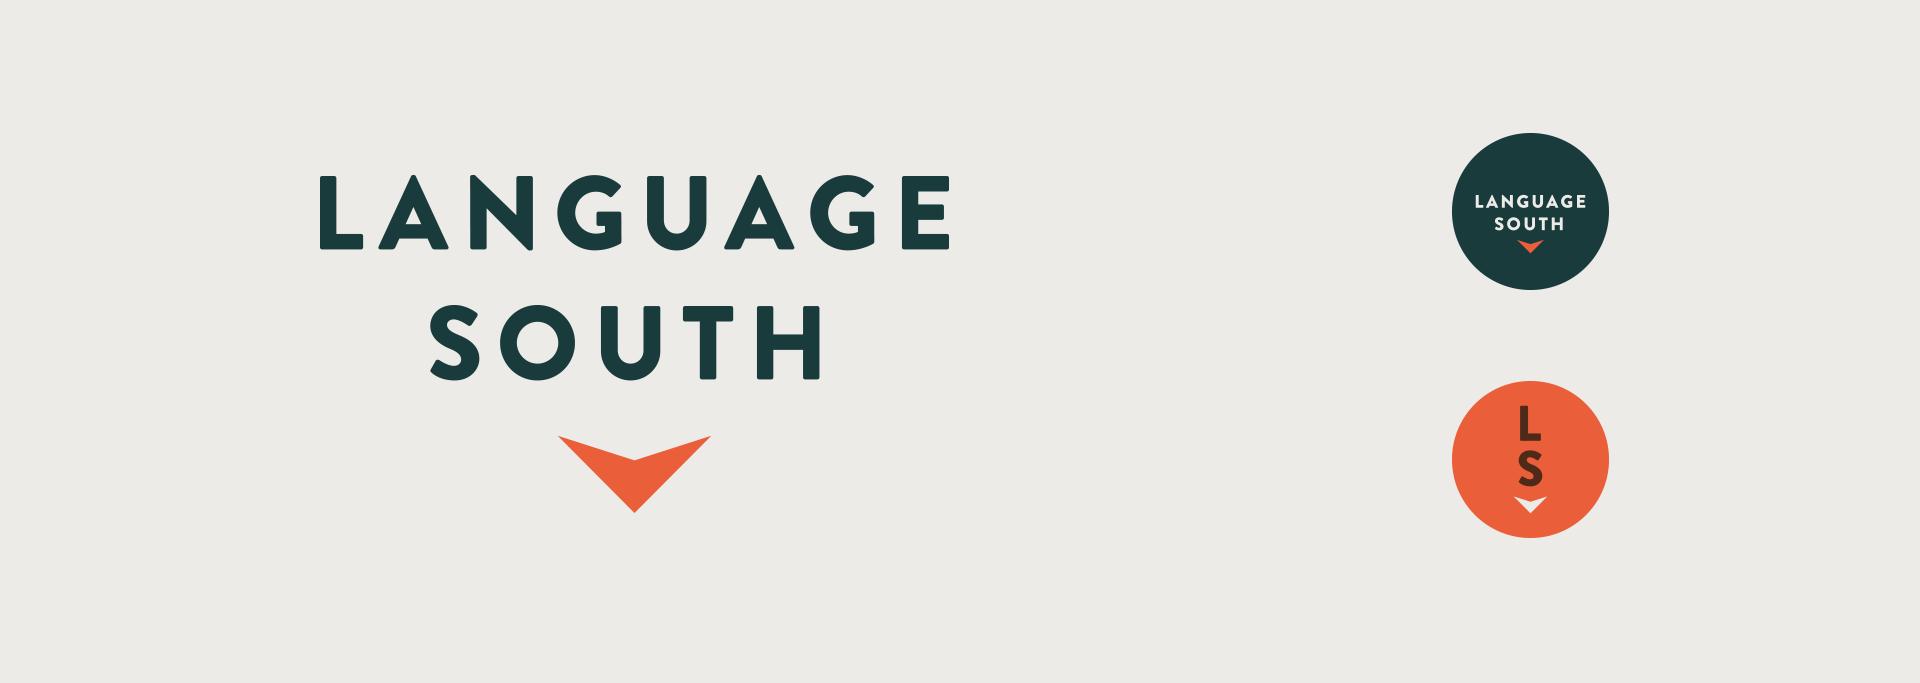 Language South - Brand Identity, Logos